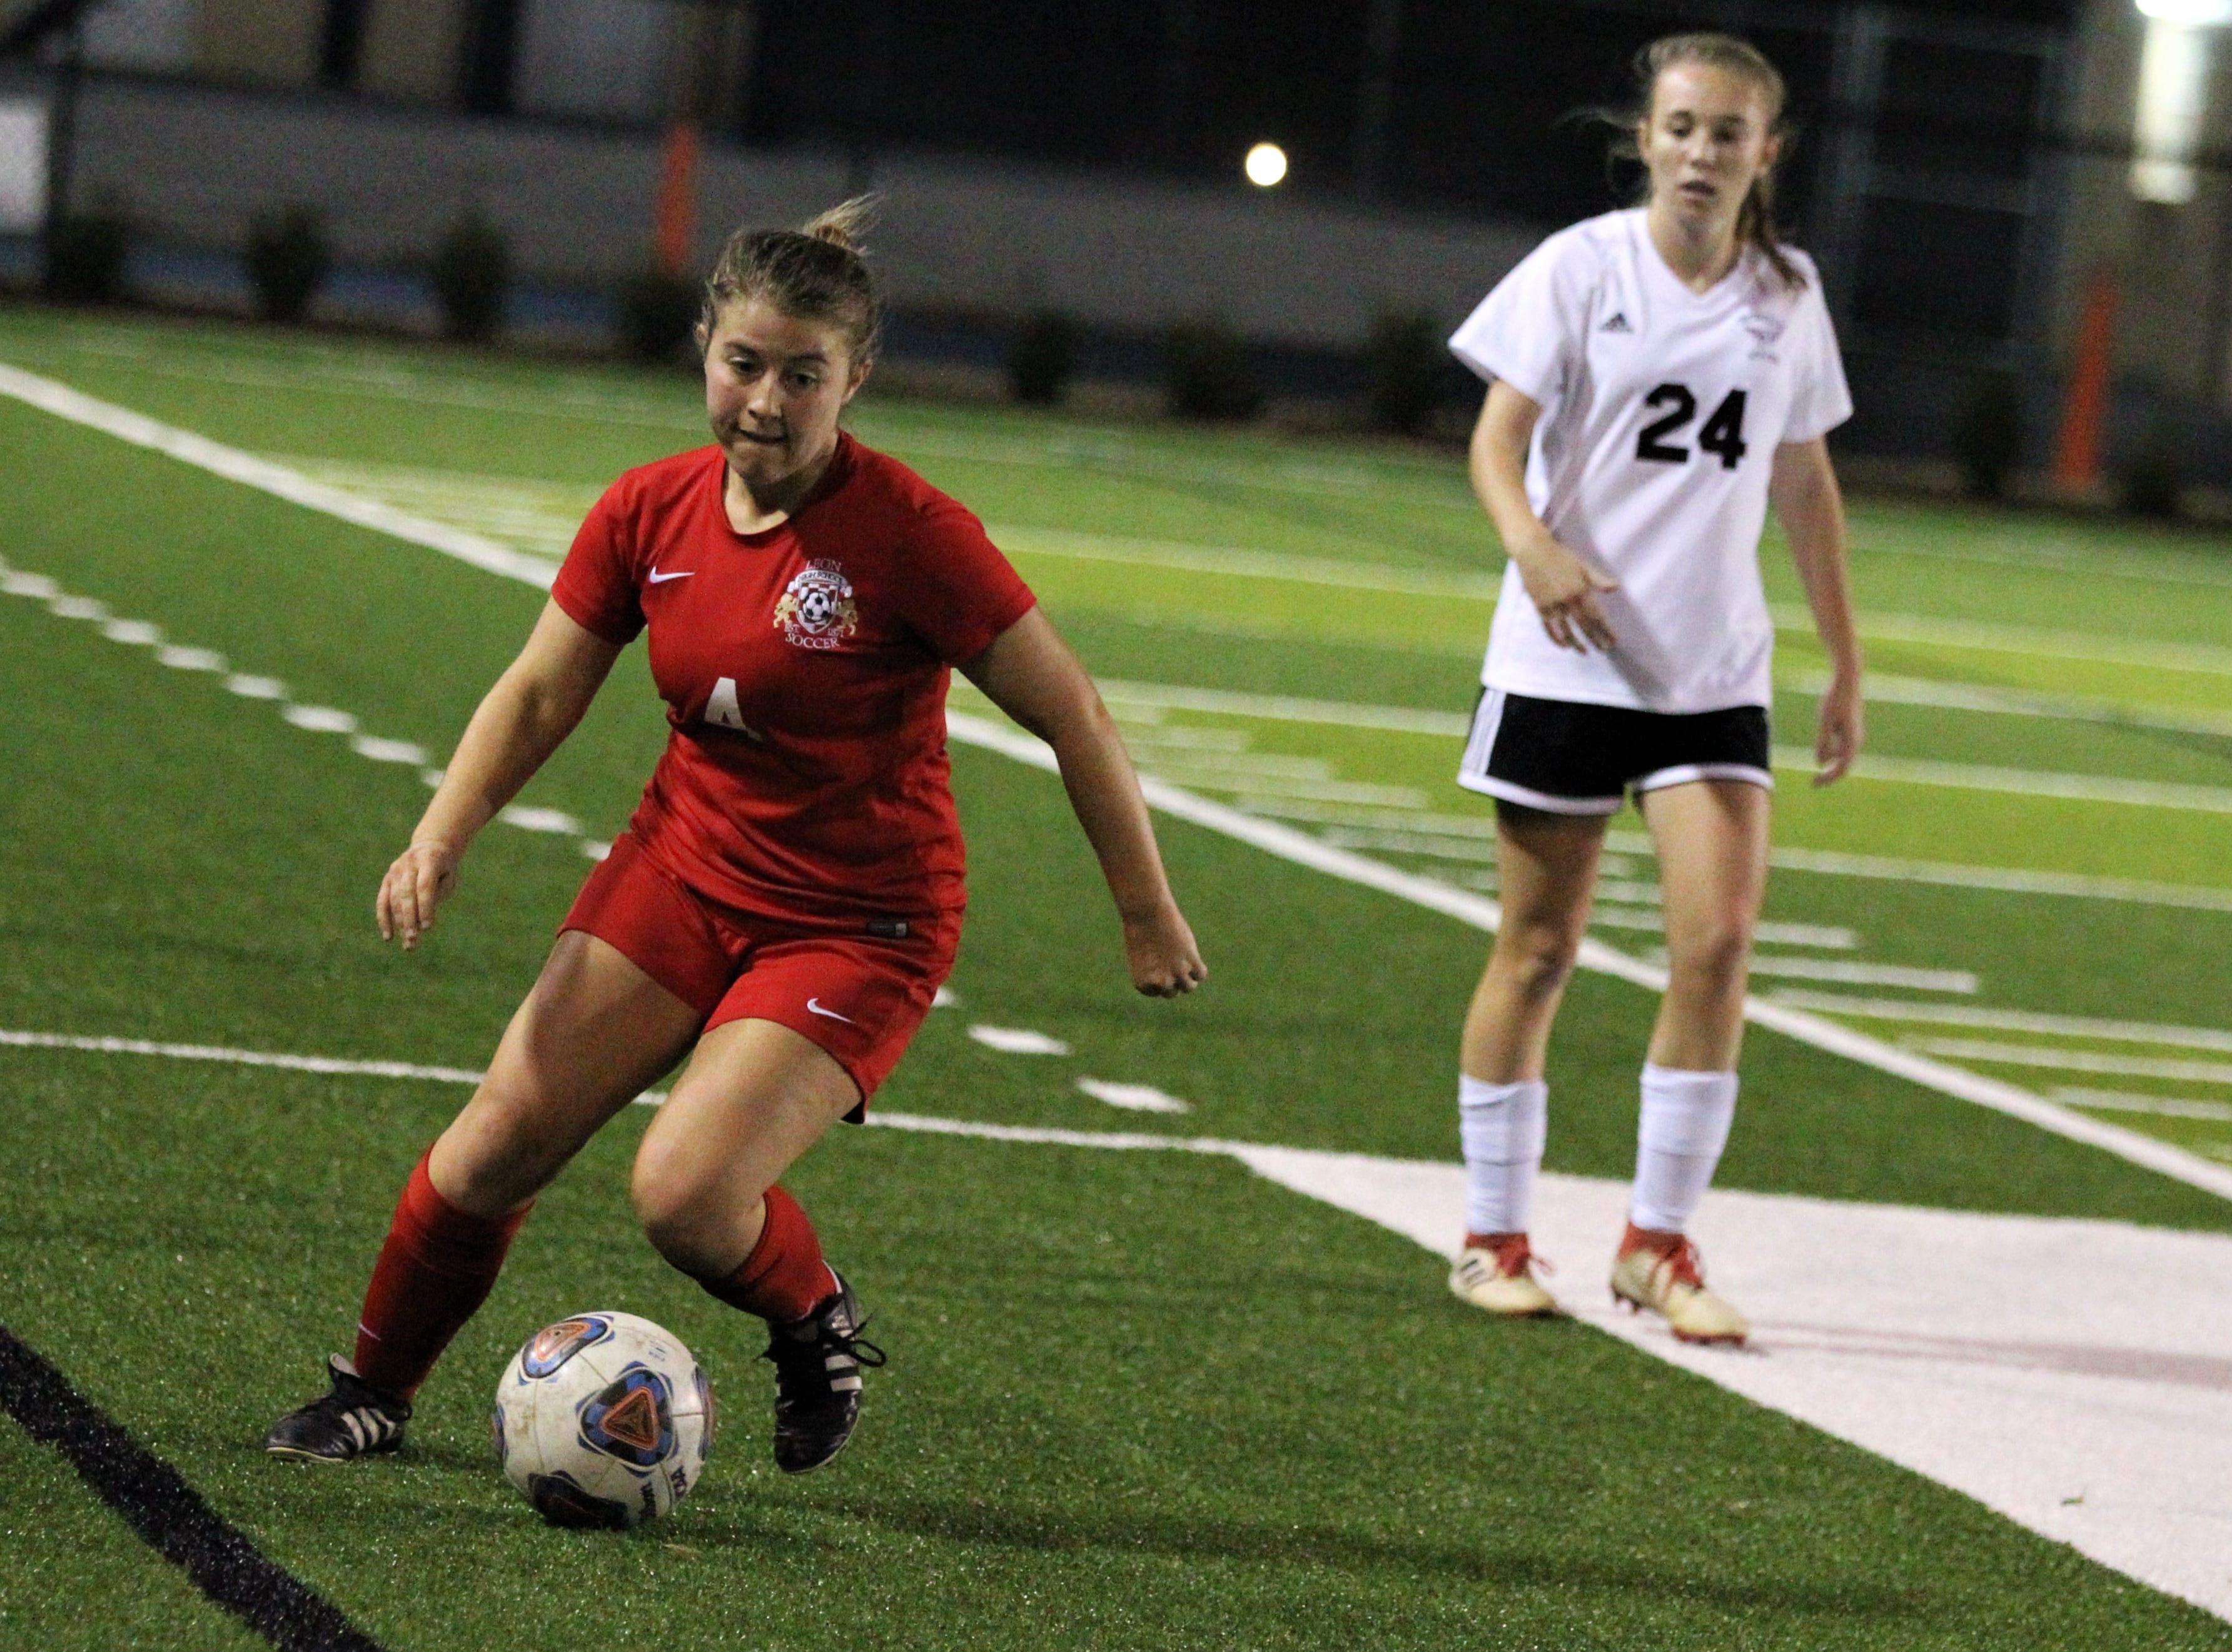 Leon's Callie Albrigo turns upfield as Niceville's girls soccer team beat Leon 1-0 in a Region 1-4A semifinal at Gene Cox Stadium on Jan. 8, 2019.